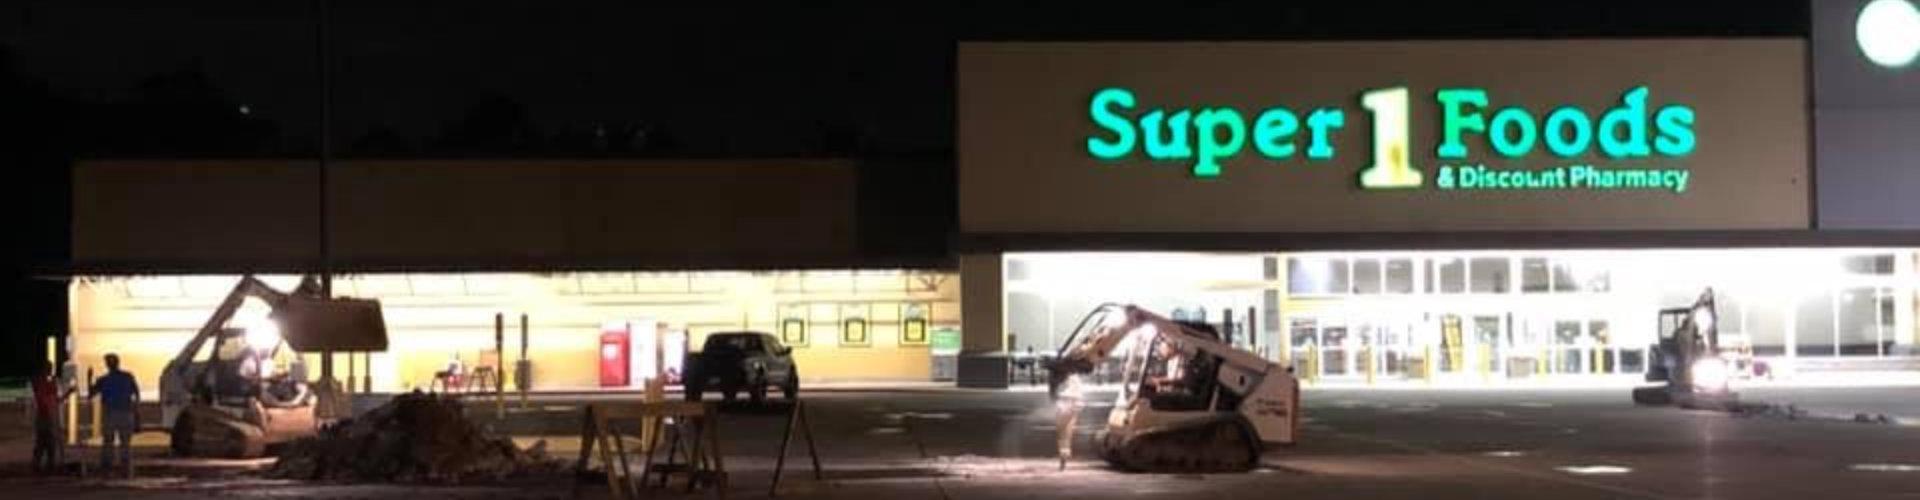 Super1foods & Discount Pharmacy